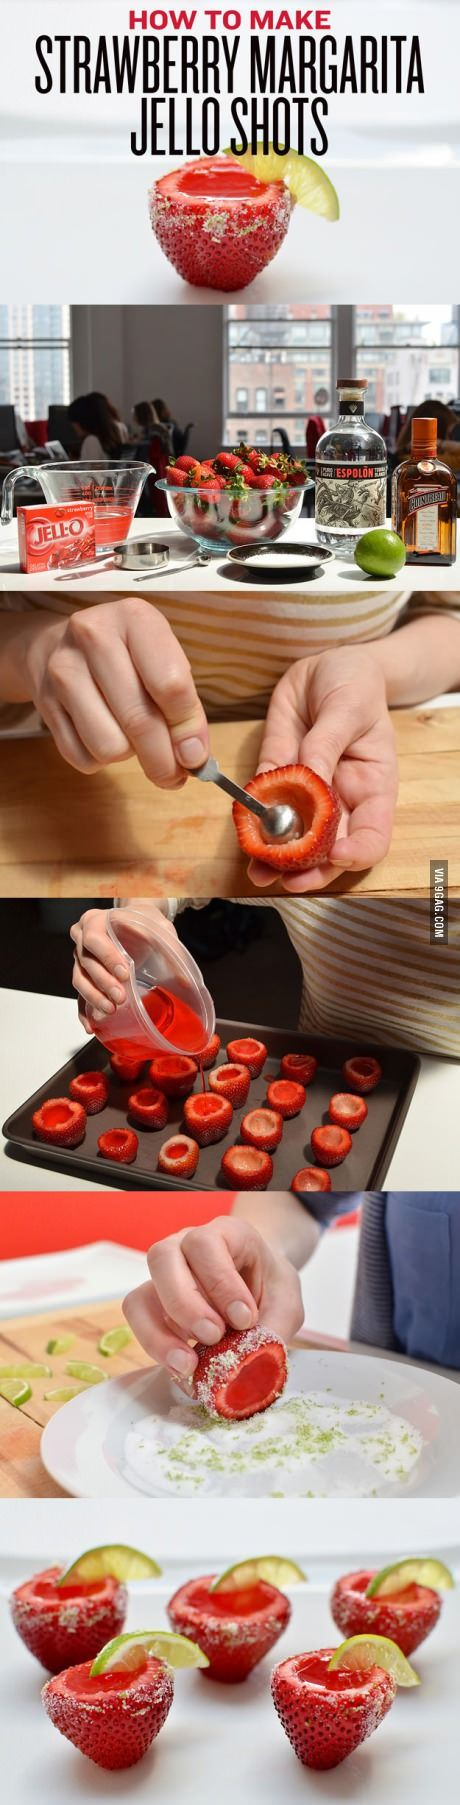 Strawberry jelly shot.